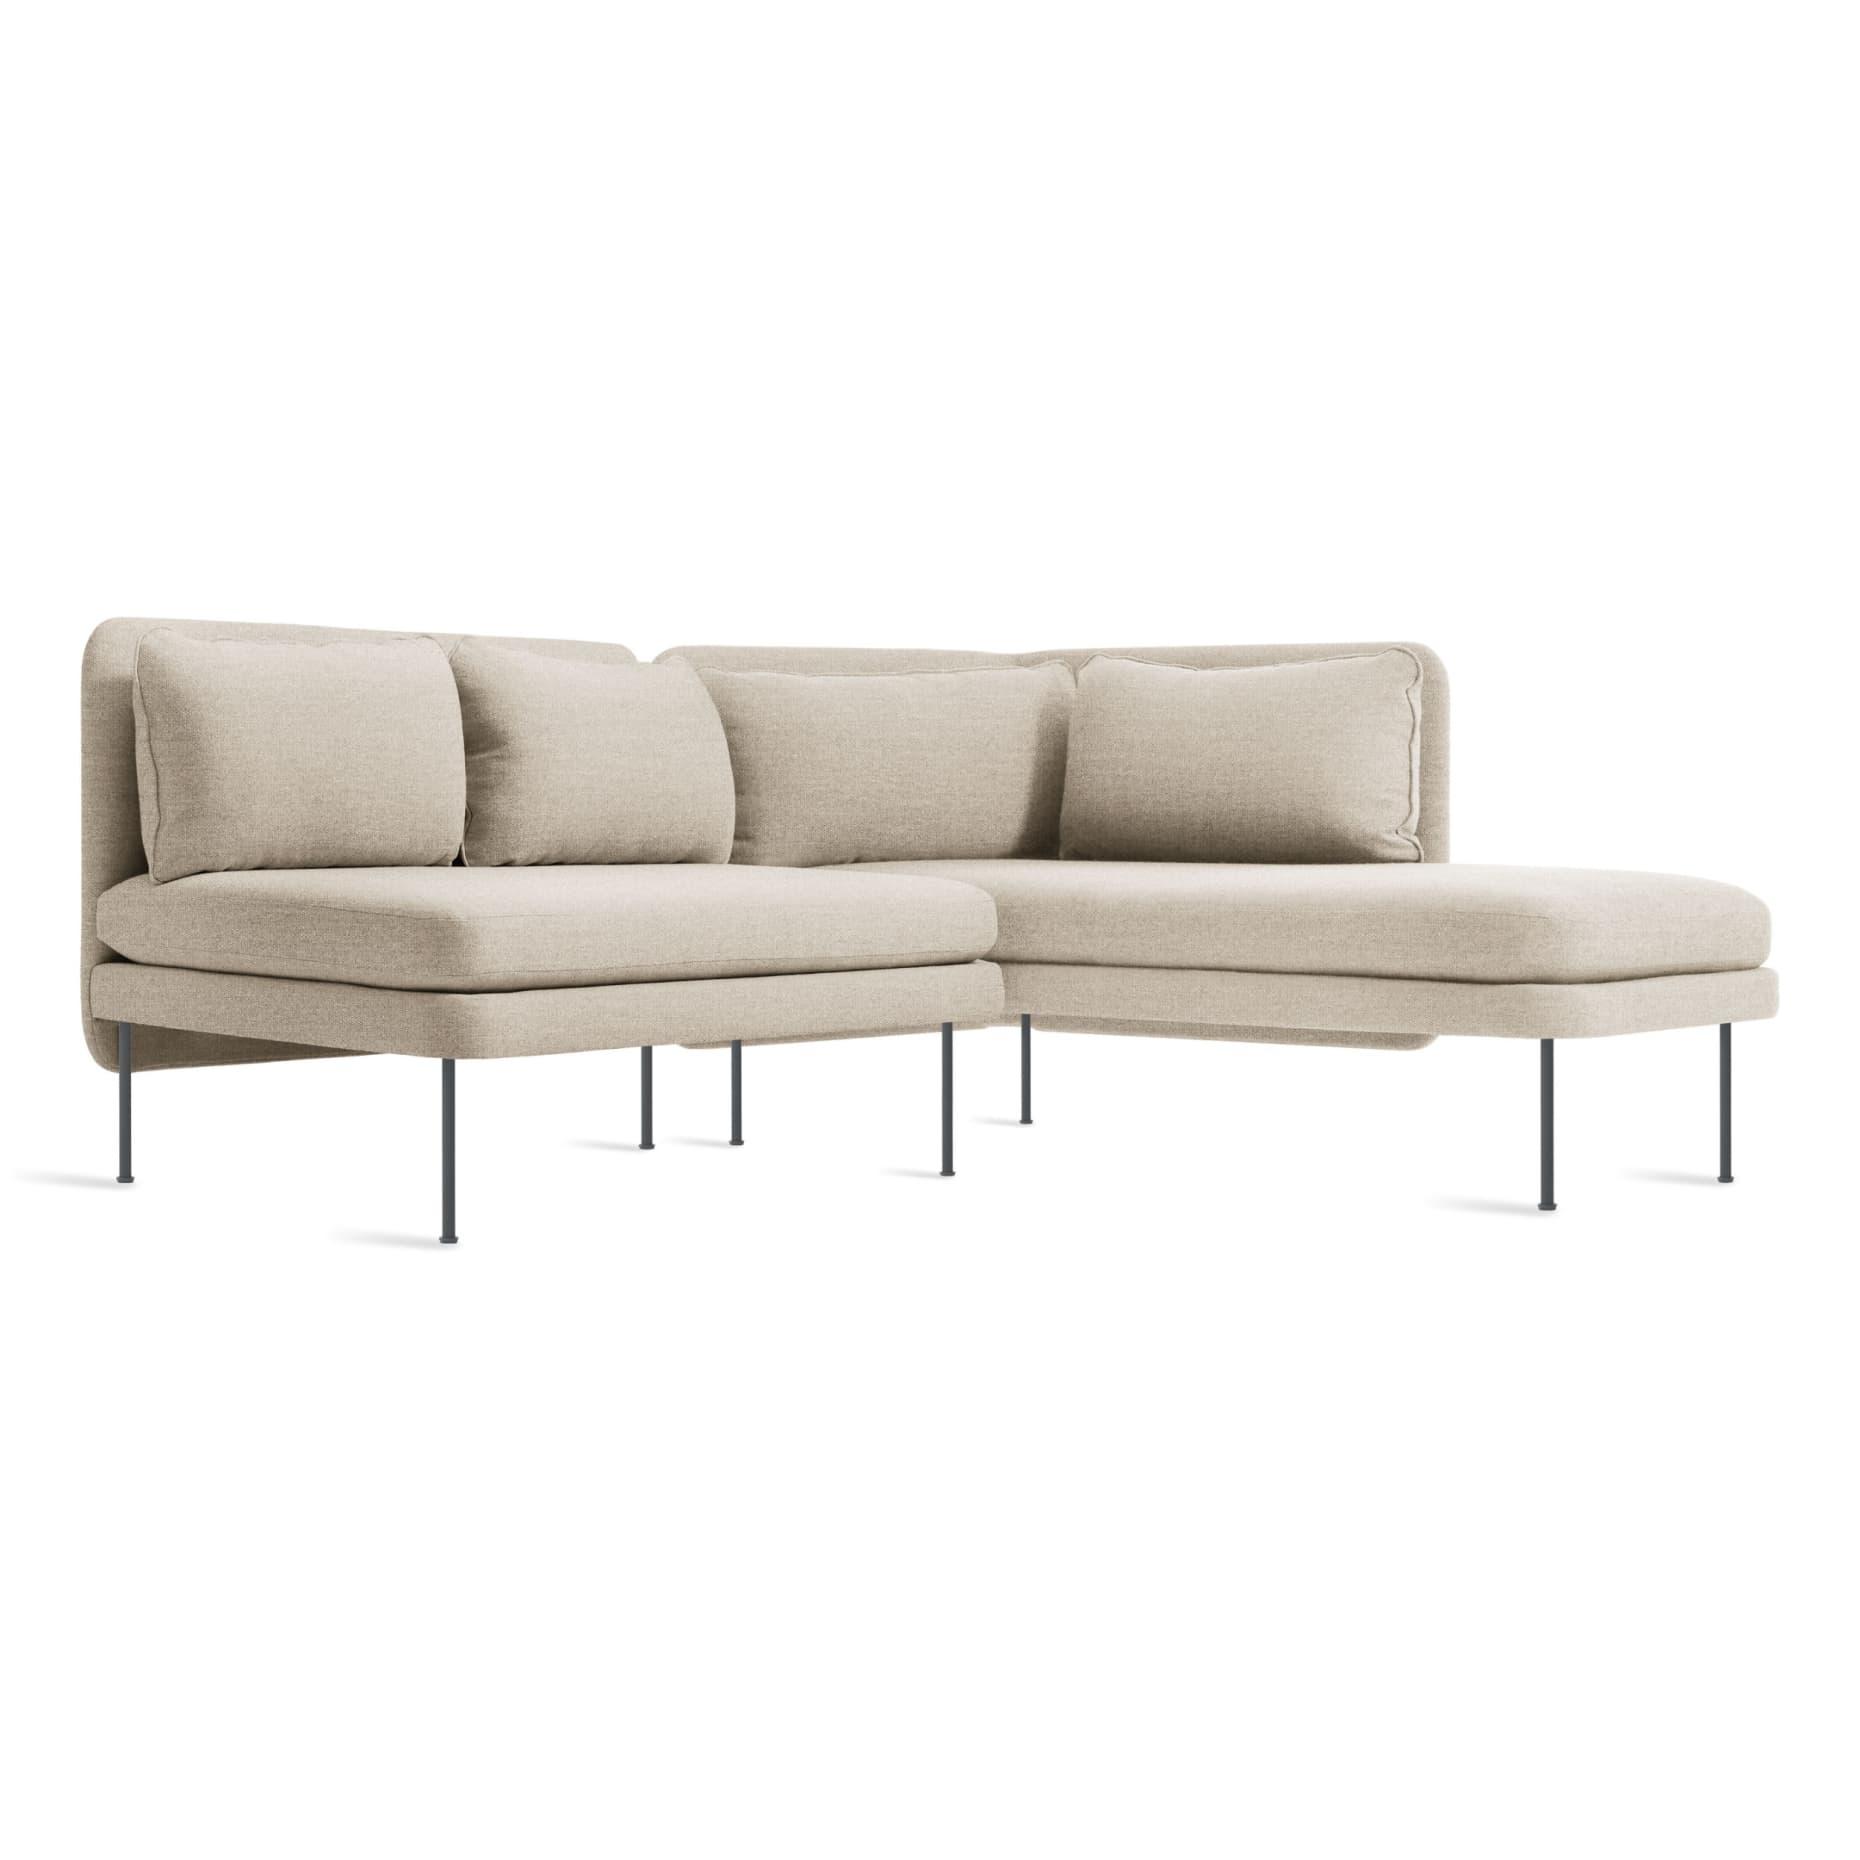 bl1 rchnam st 34 bloke armless sofa w right chaise tait stone